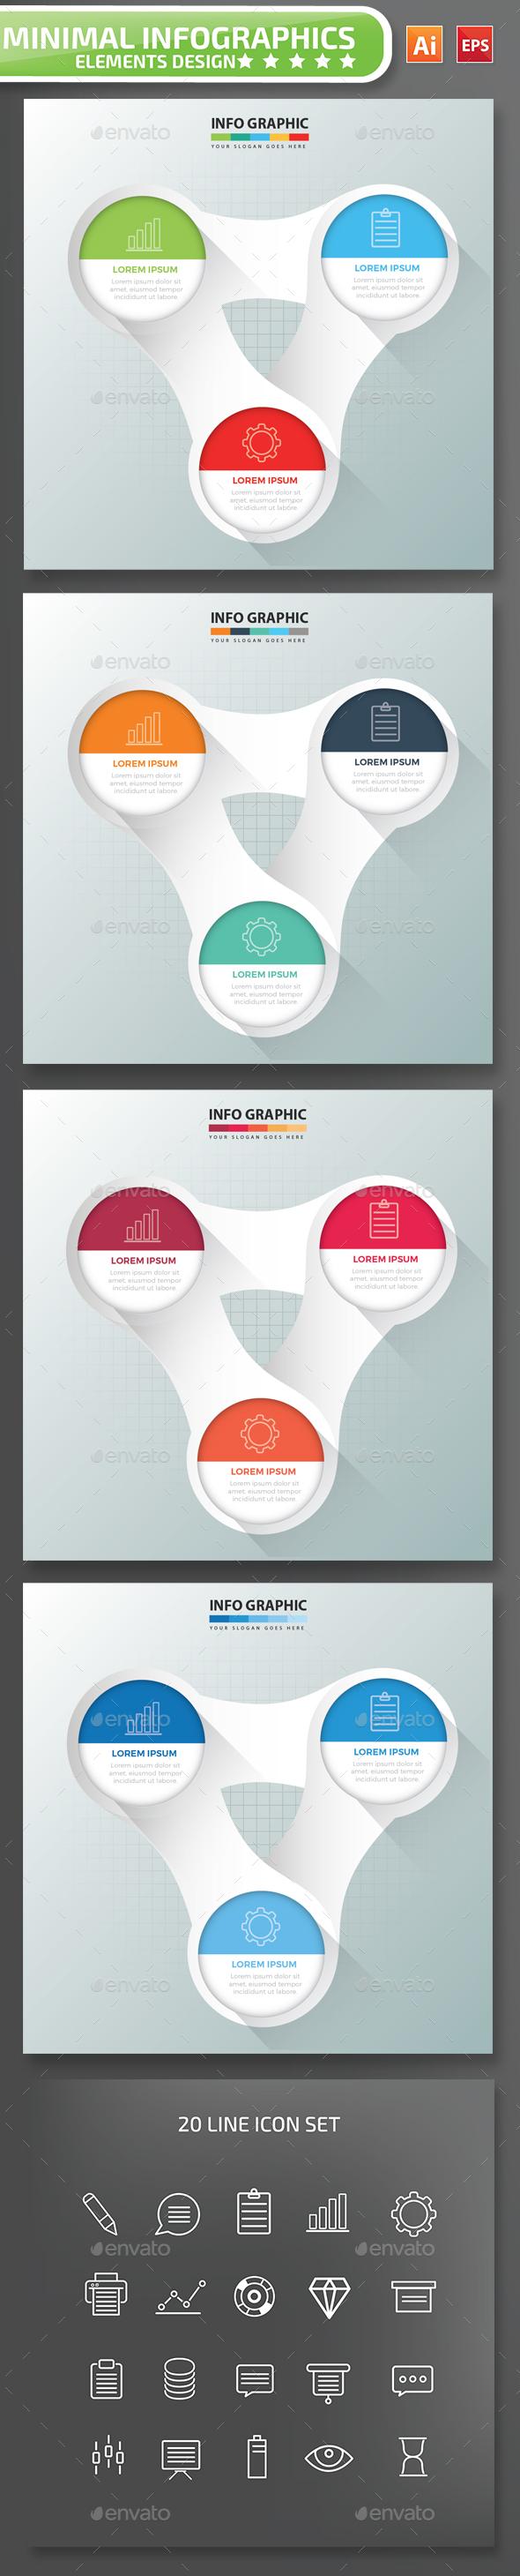 Minimal 3 step infographic Design